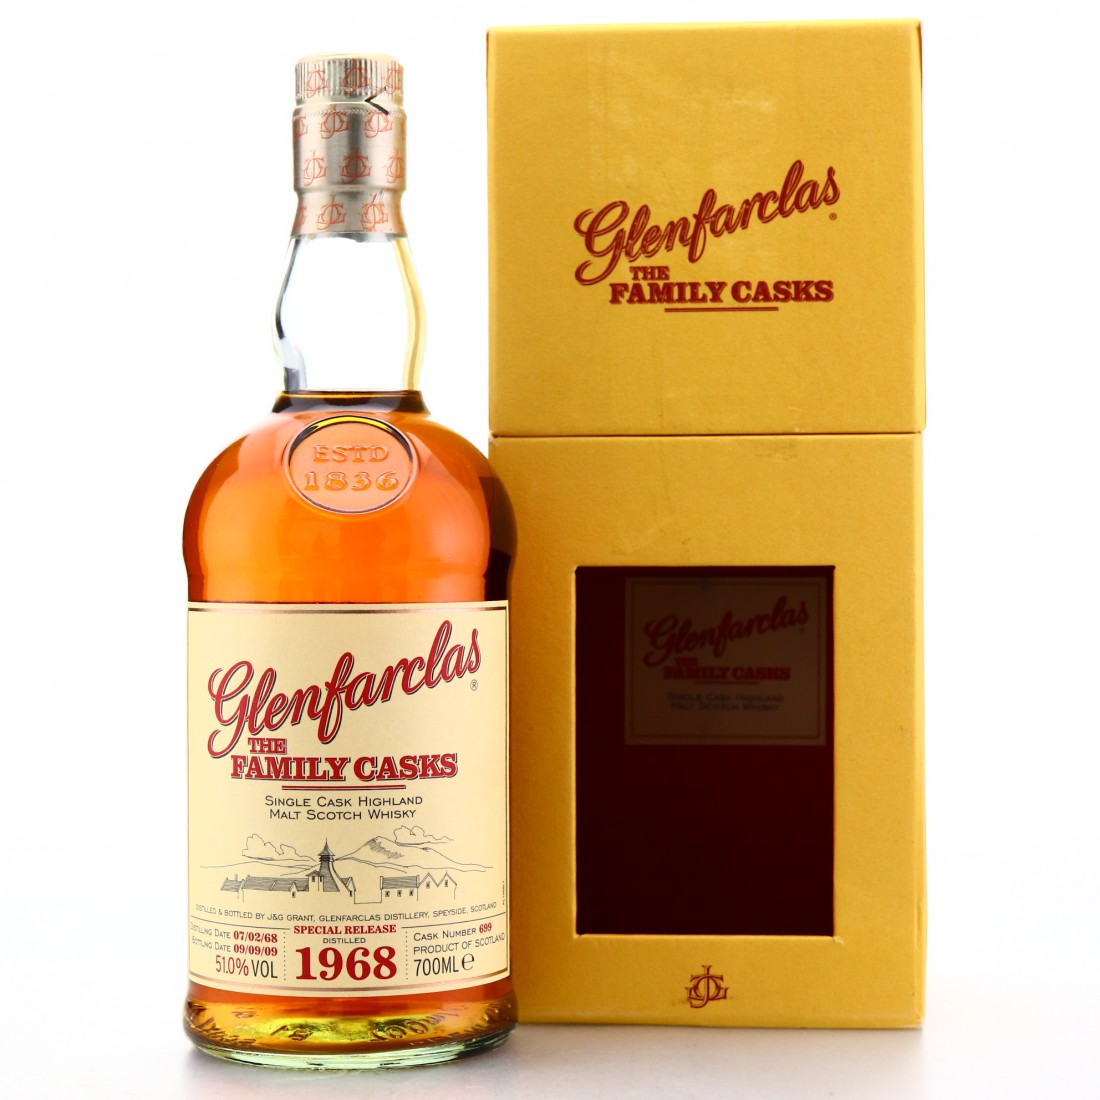 Glenfarclas 1968 Family Cask #699 / Lindores Whisky Society 5th Anniversary